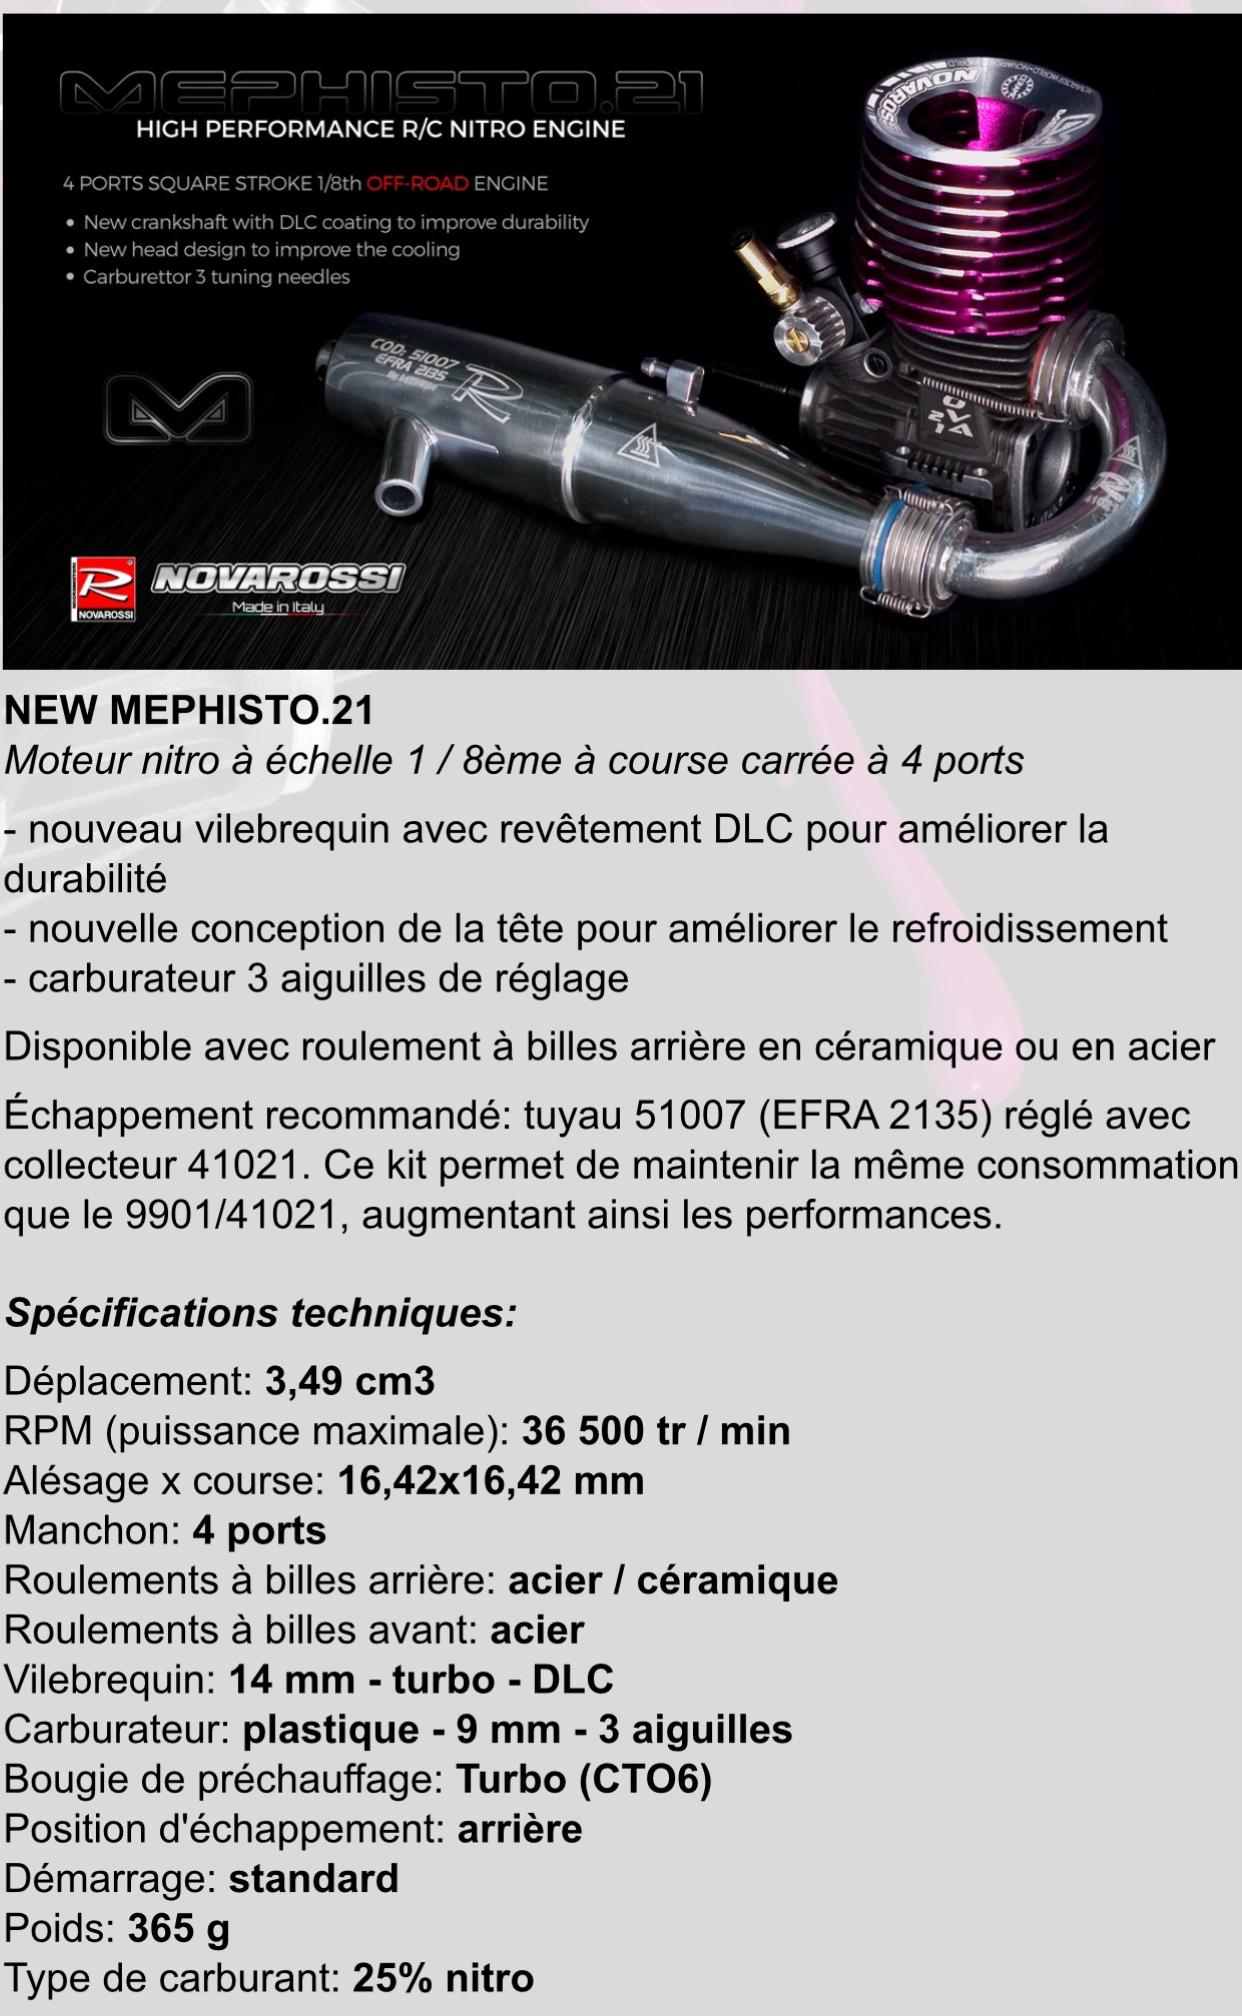 Novarossi mephisto  21 Worlds édition tt 1/8 | RCmag - Le